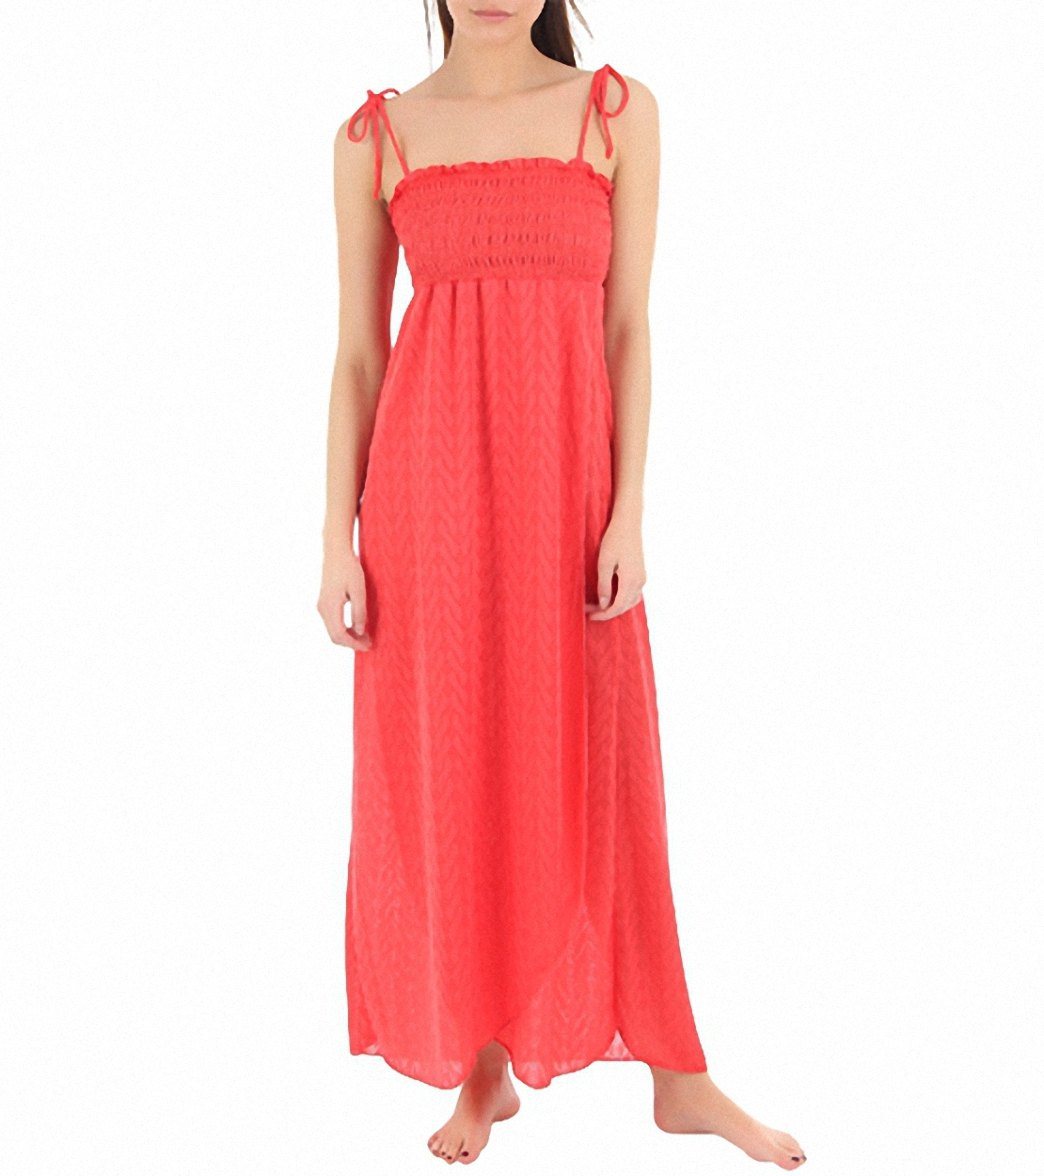 b8d32c26b0f3f Jordan Taylor Martime Smocked Maxi Dress